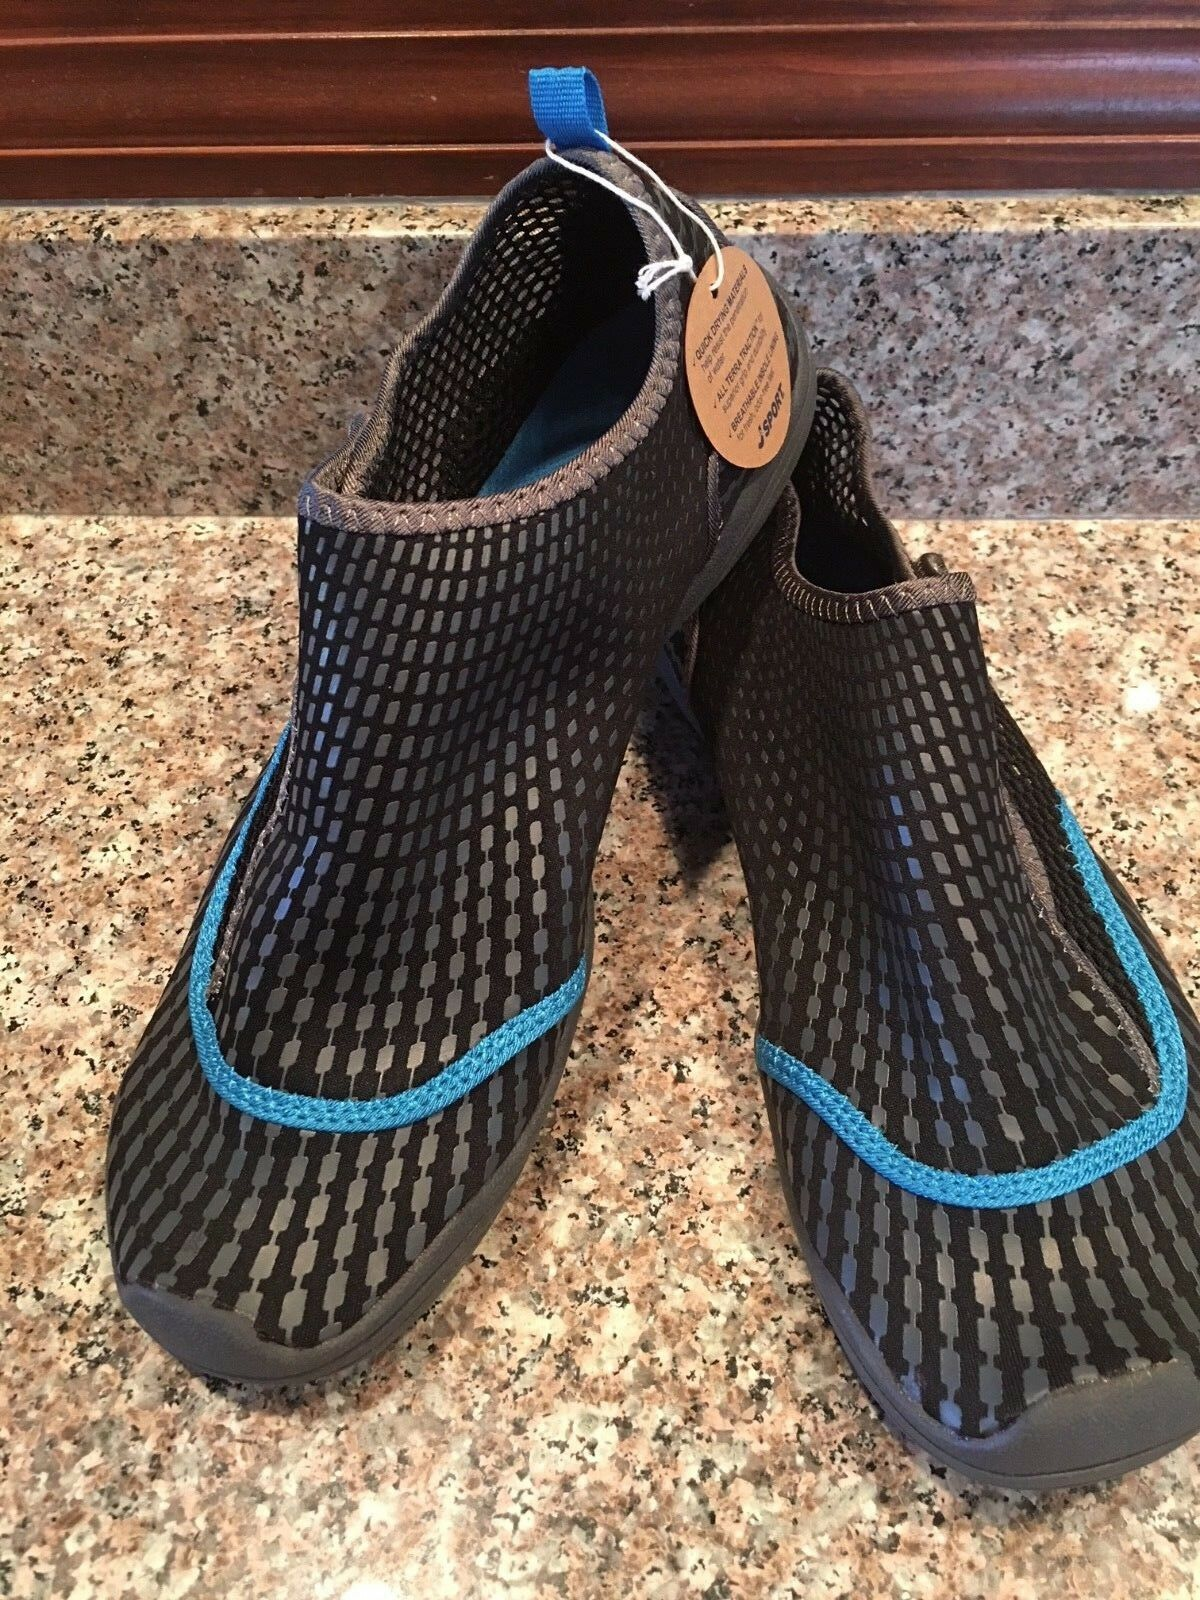 WOMEN'S JSPORT JAMBU MERMAID WATER ATHLETIC SHOES BLACK blueE 8 8 8 8.5 9 NEW w  TAG 3a44fd